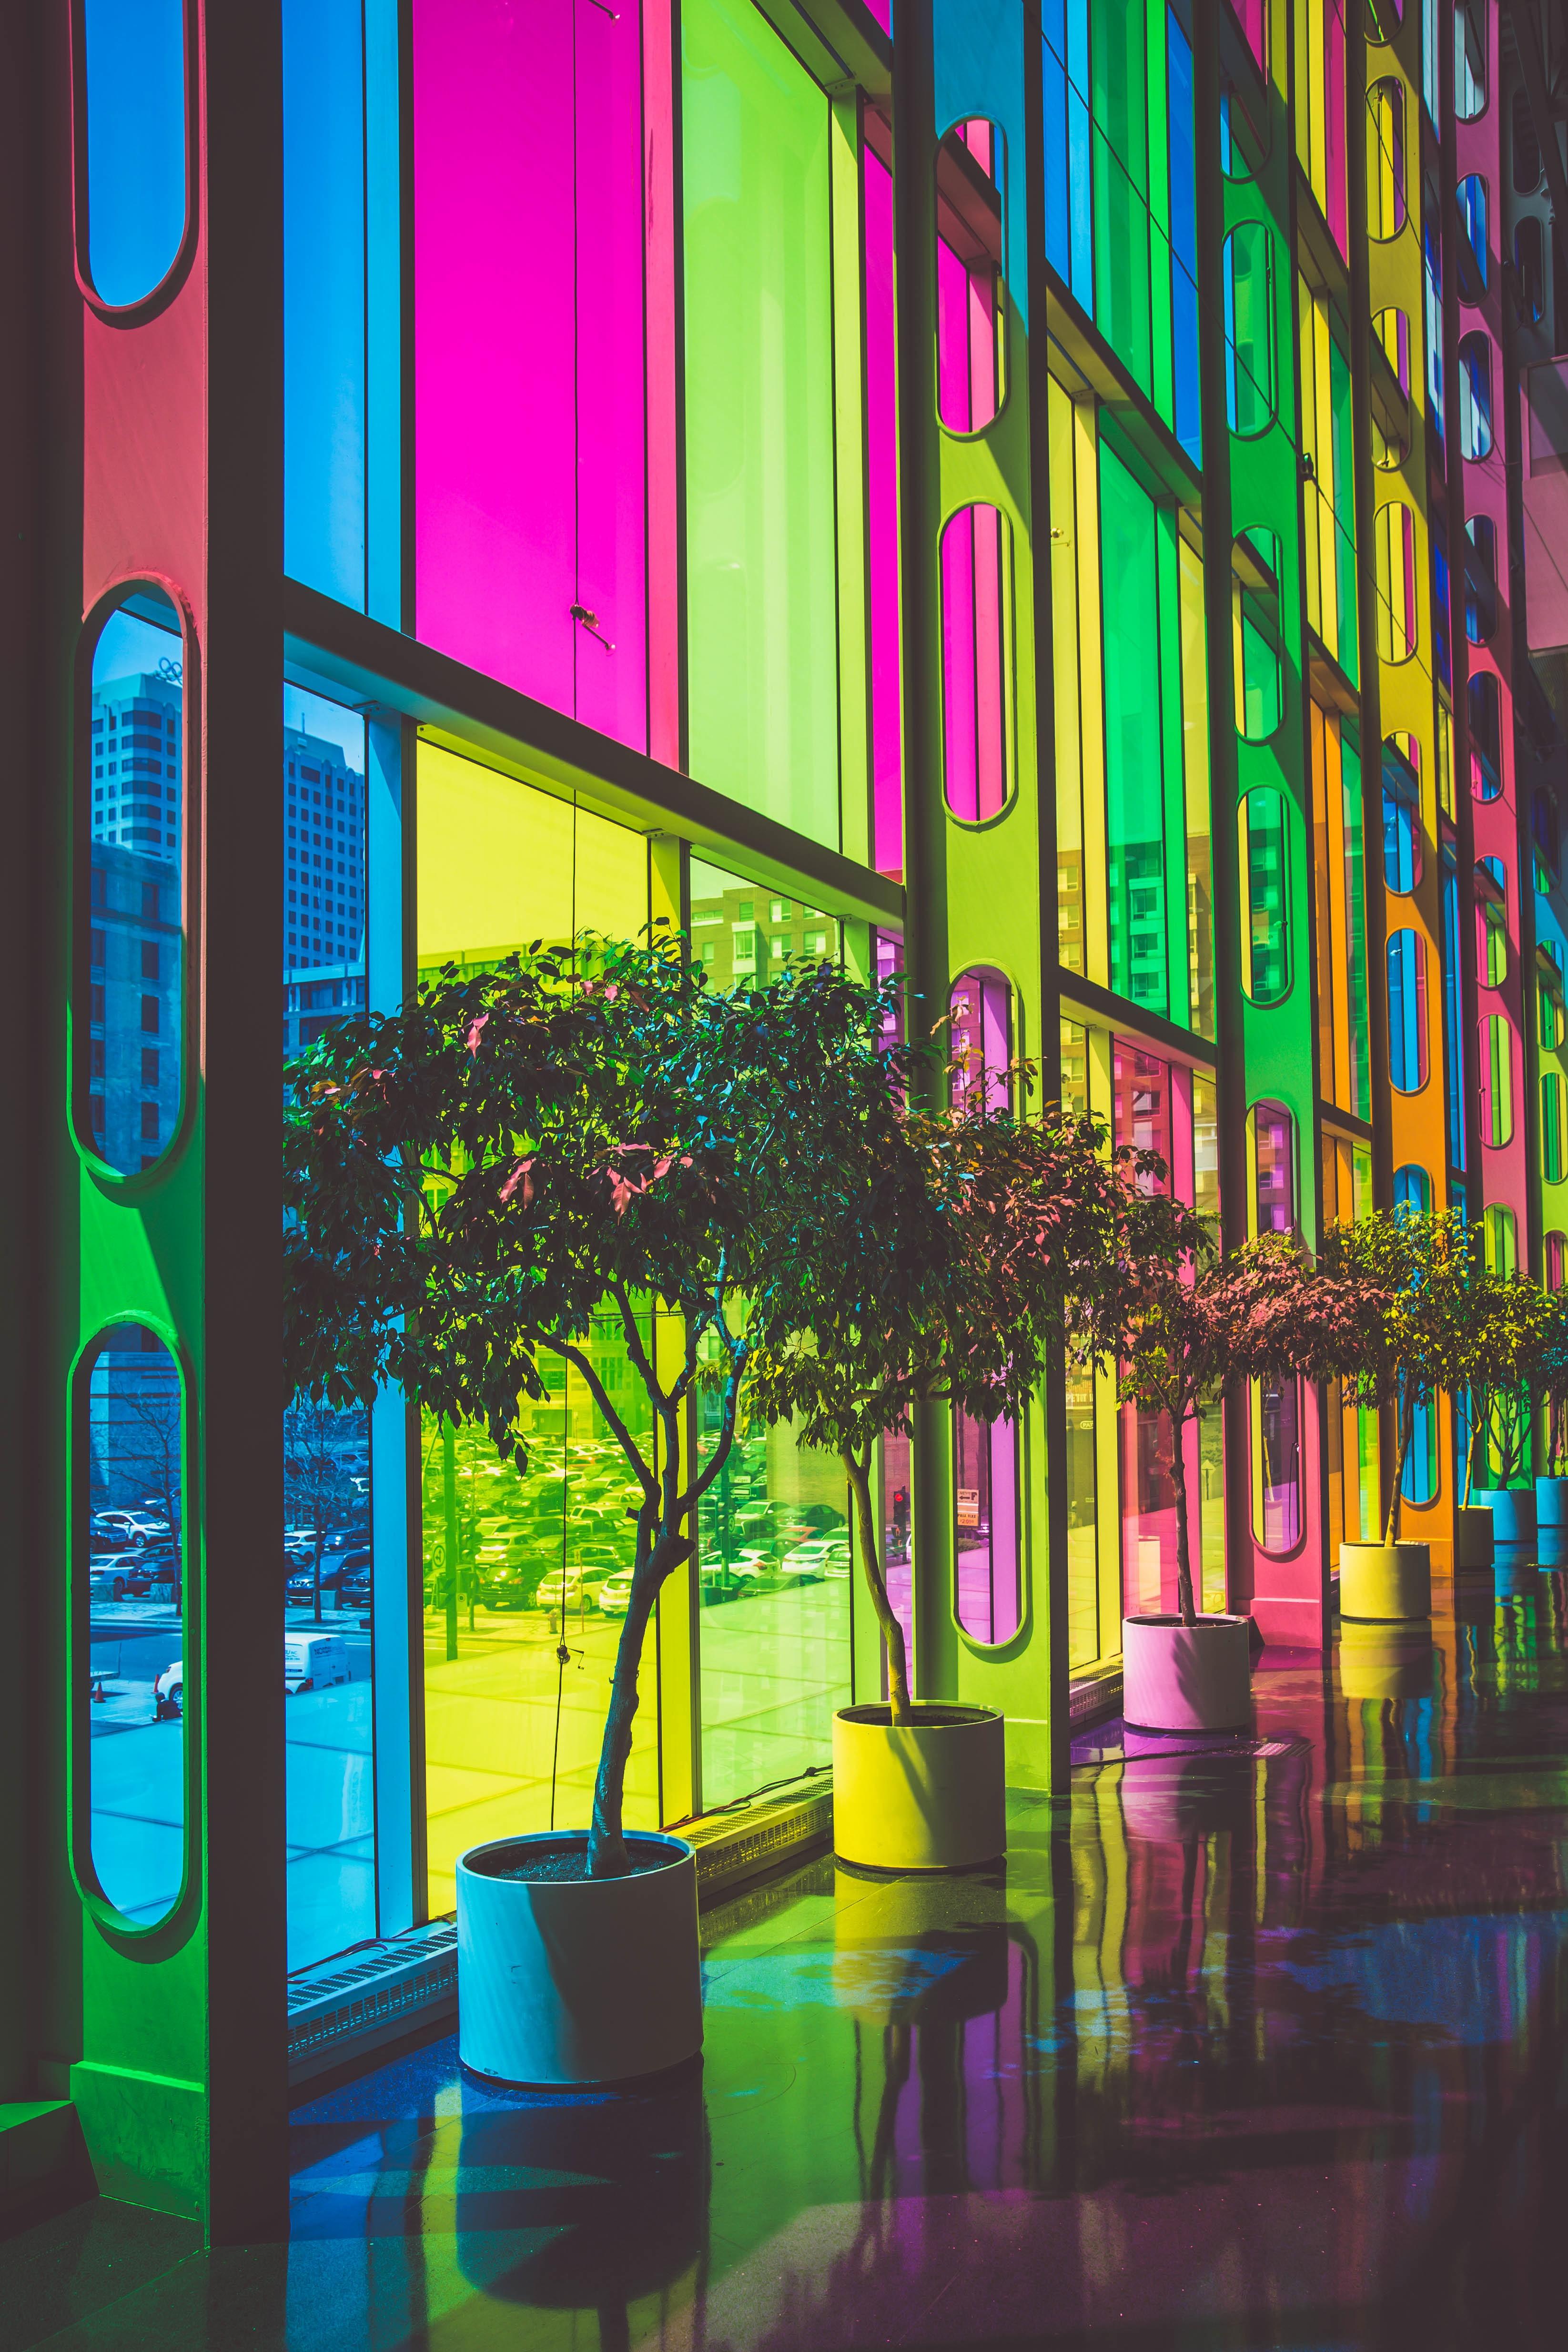 Tree Window Glass Color Facade Interior Design Art Rainbow Design Shape  Modern Art Urban Area